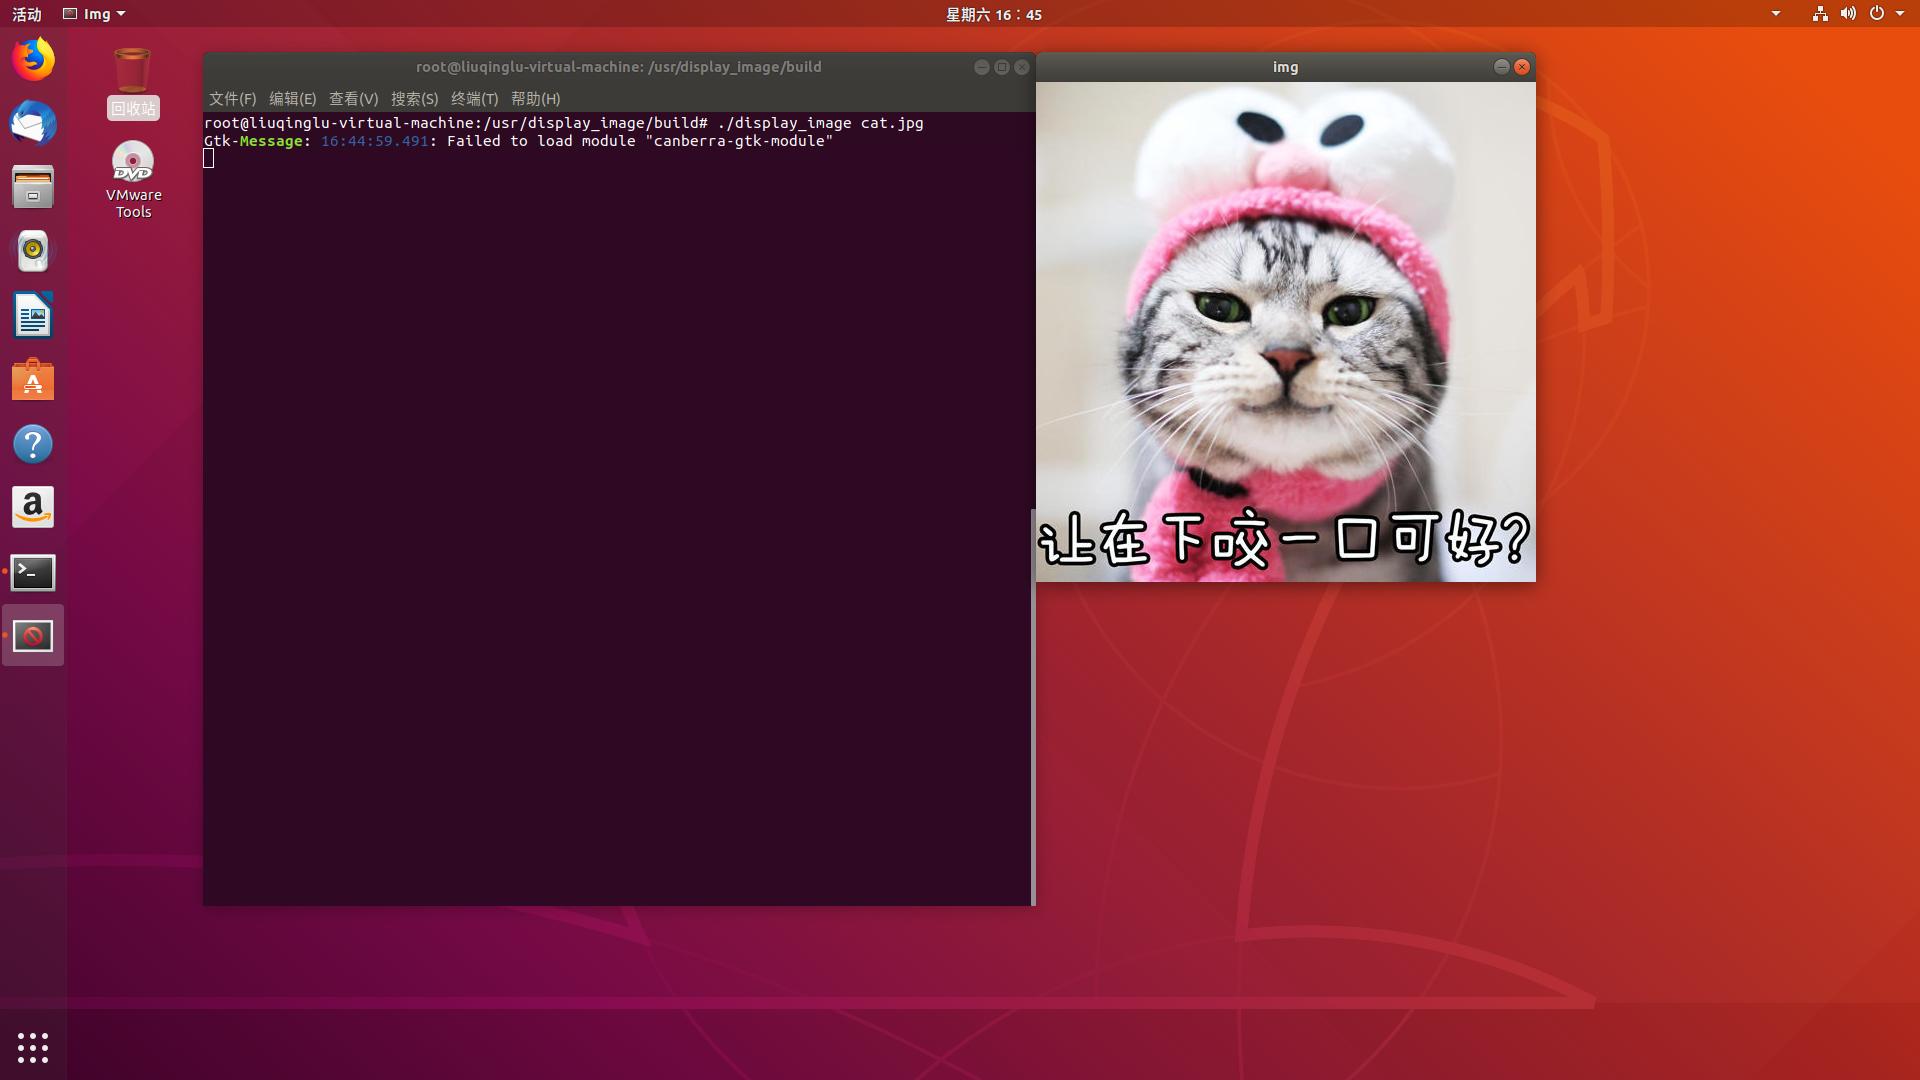 使用 opencv 显示猫片